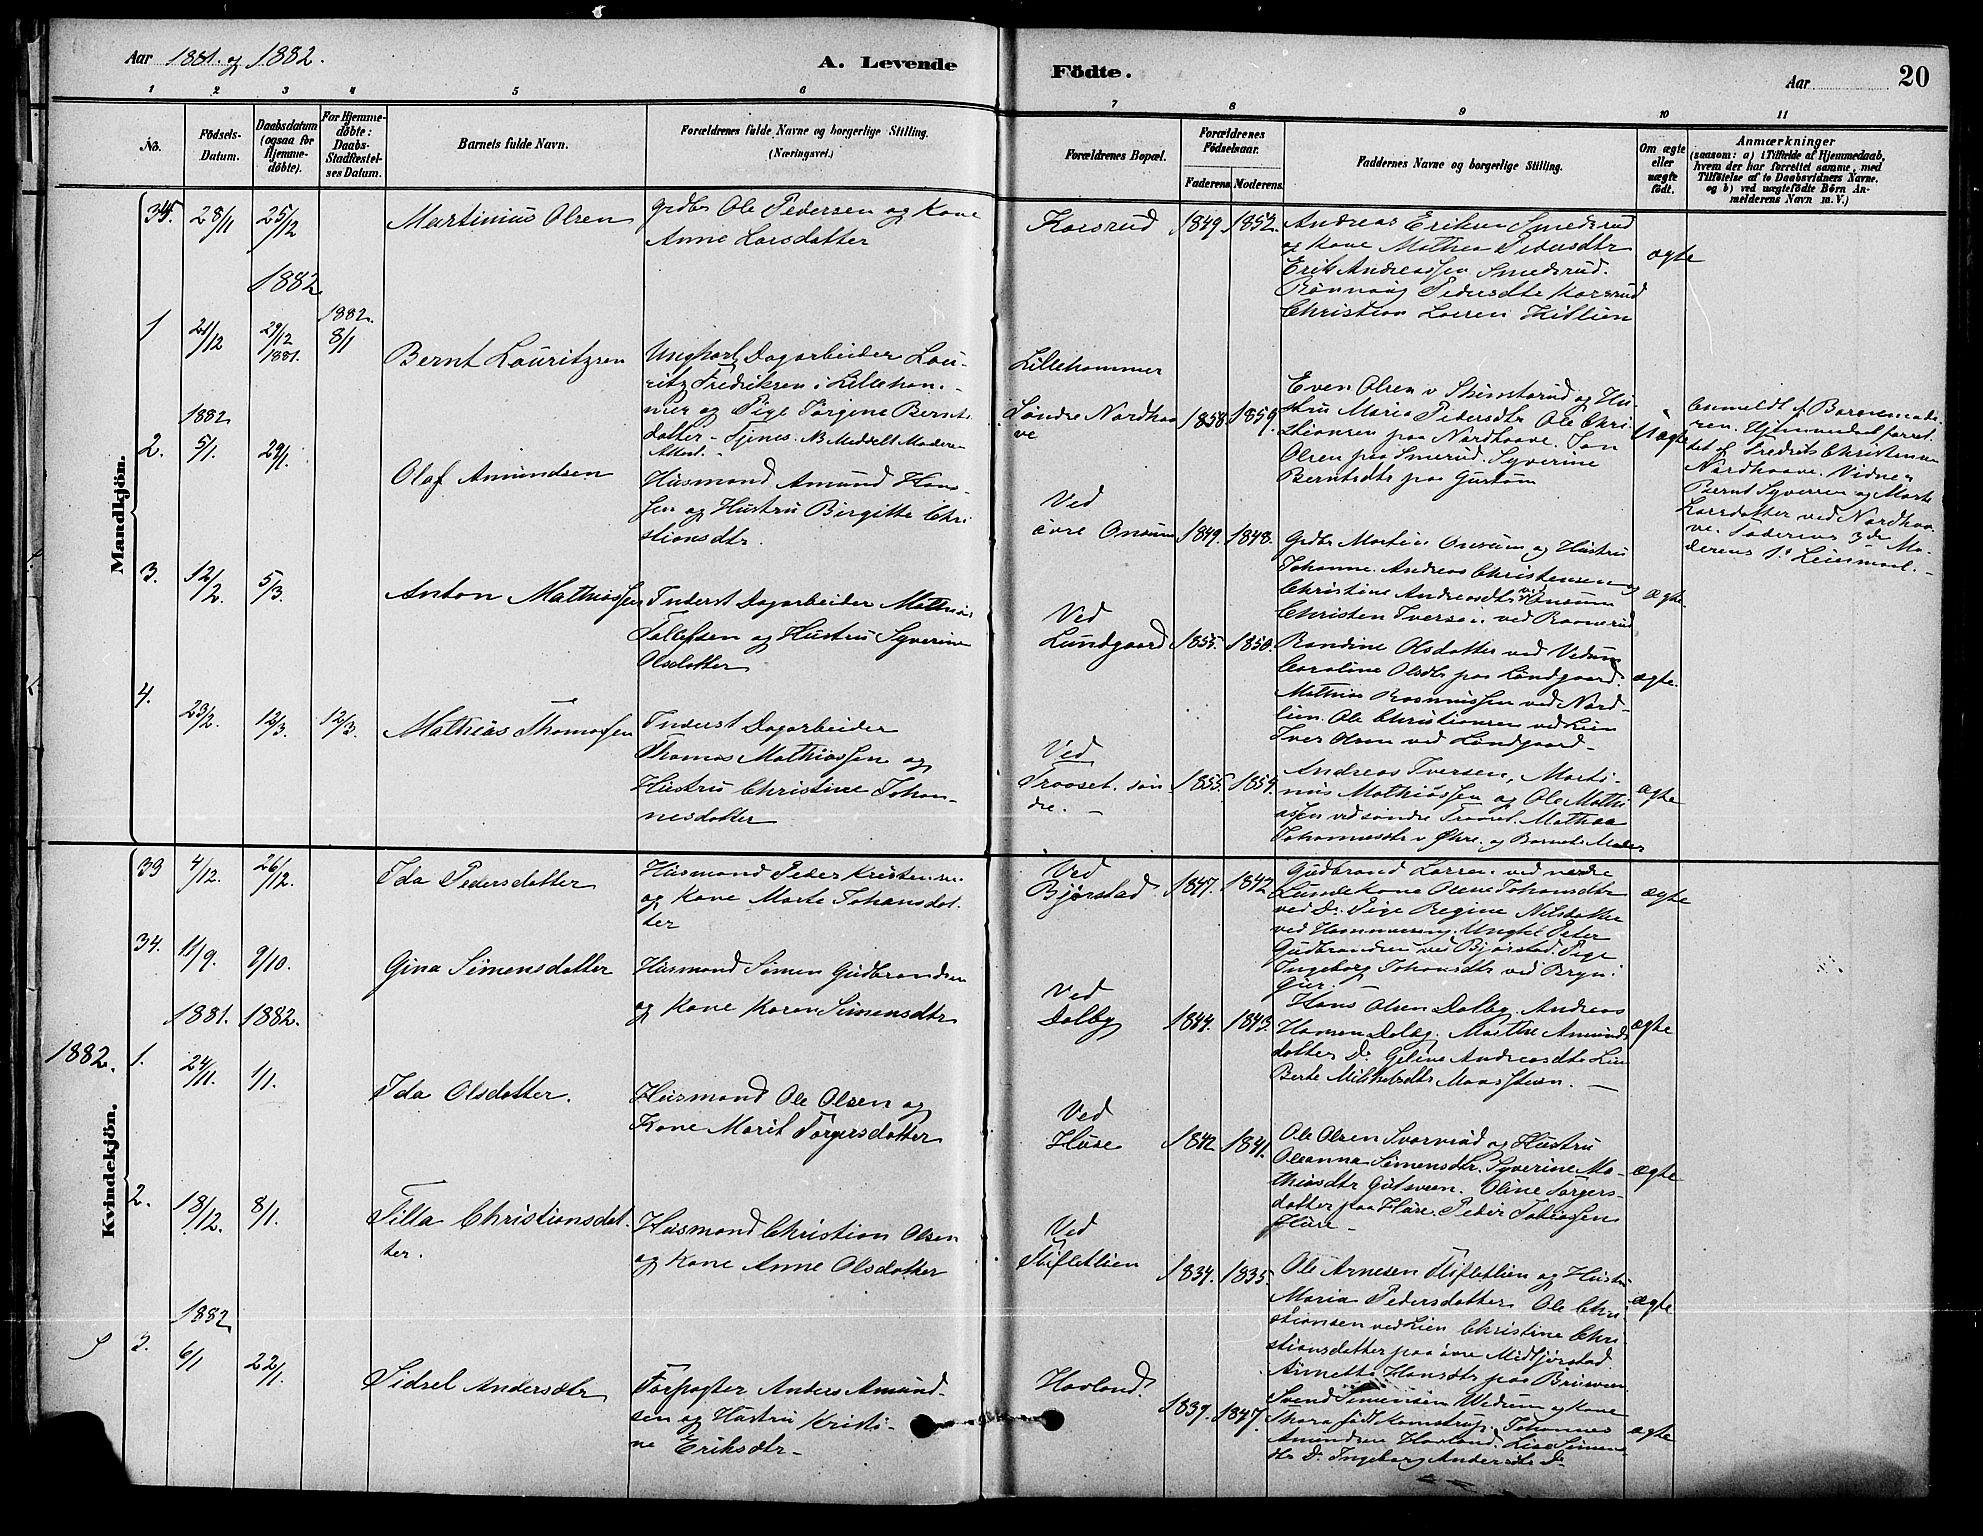 SAH, Fåberg prestekontor, Ministerialbok nr. 8, 1879-1898, s. 20